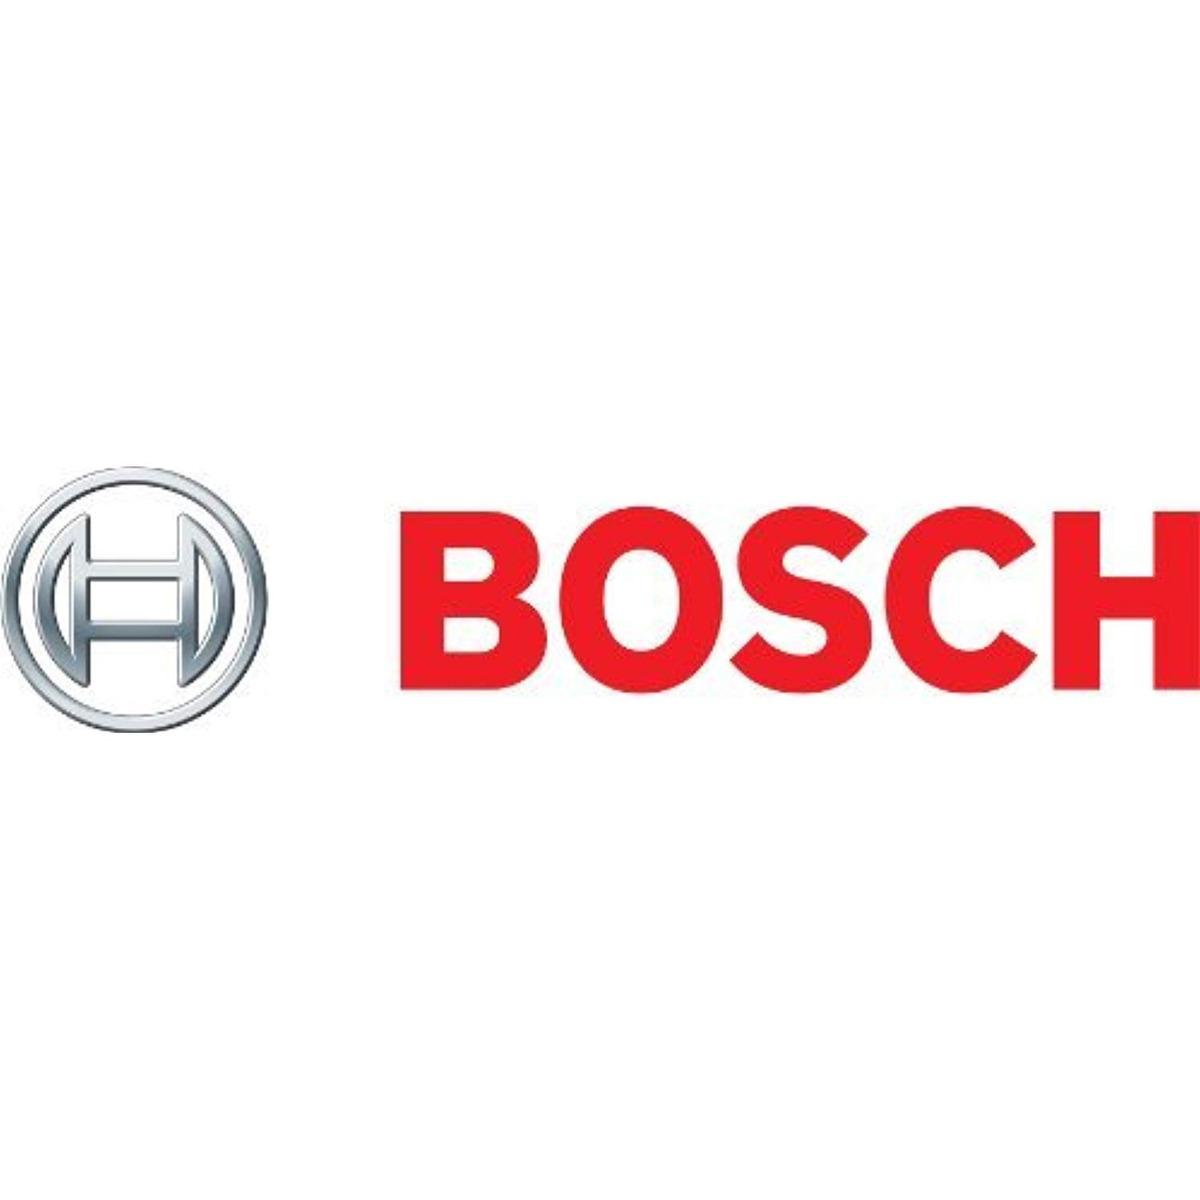 BOSCH SECURCOMM MODEM WINDOWS 8 DRIVERS DOWNLOAD